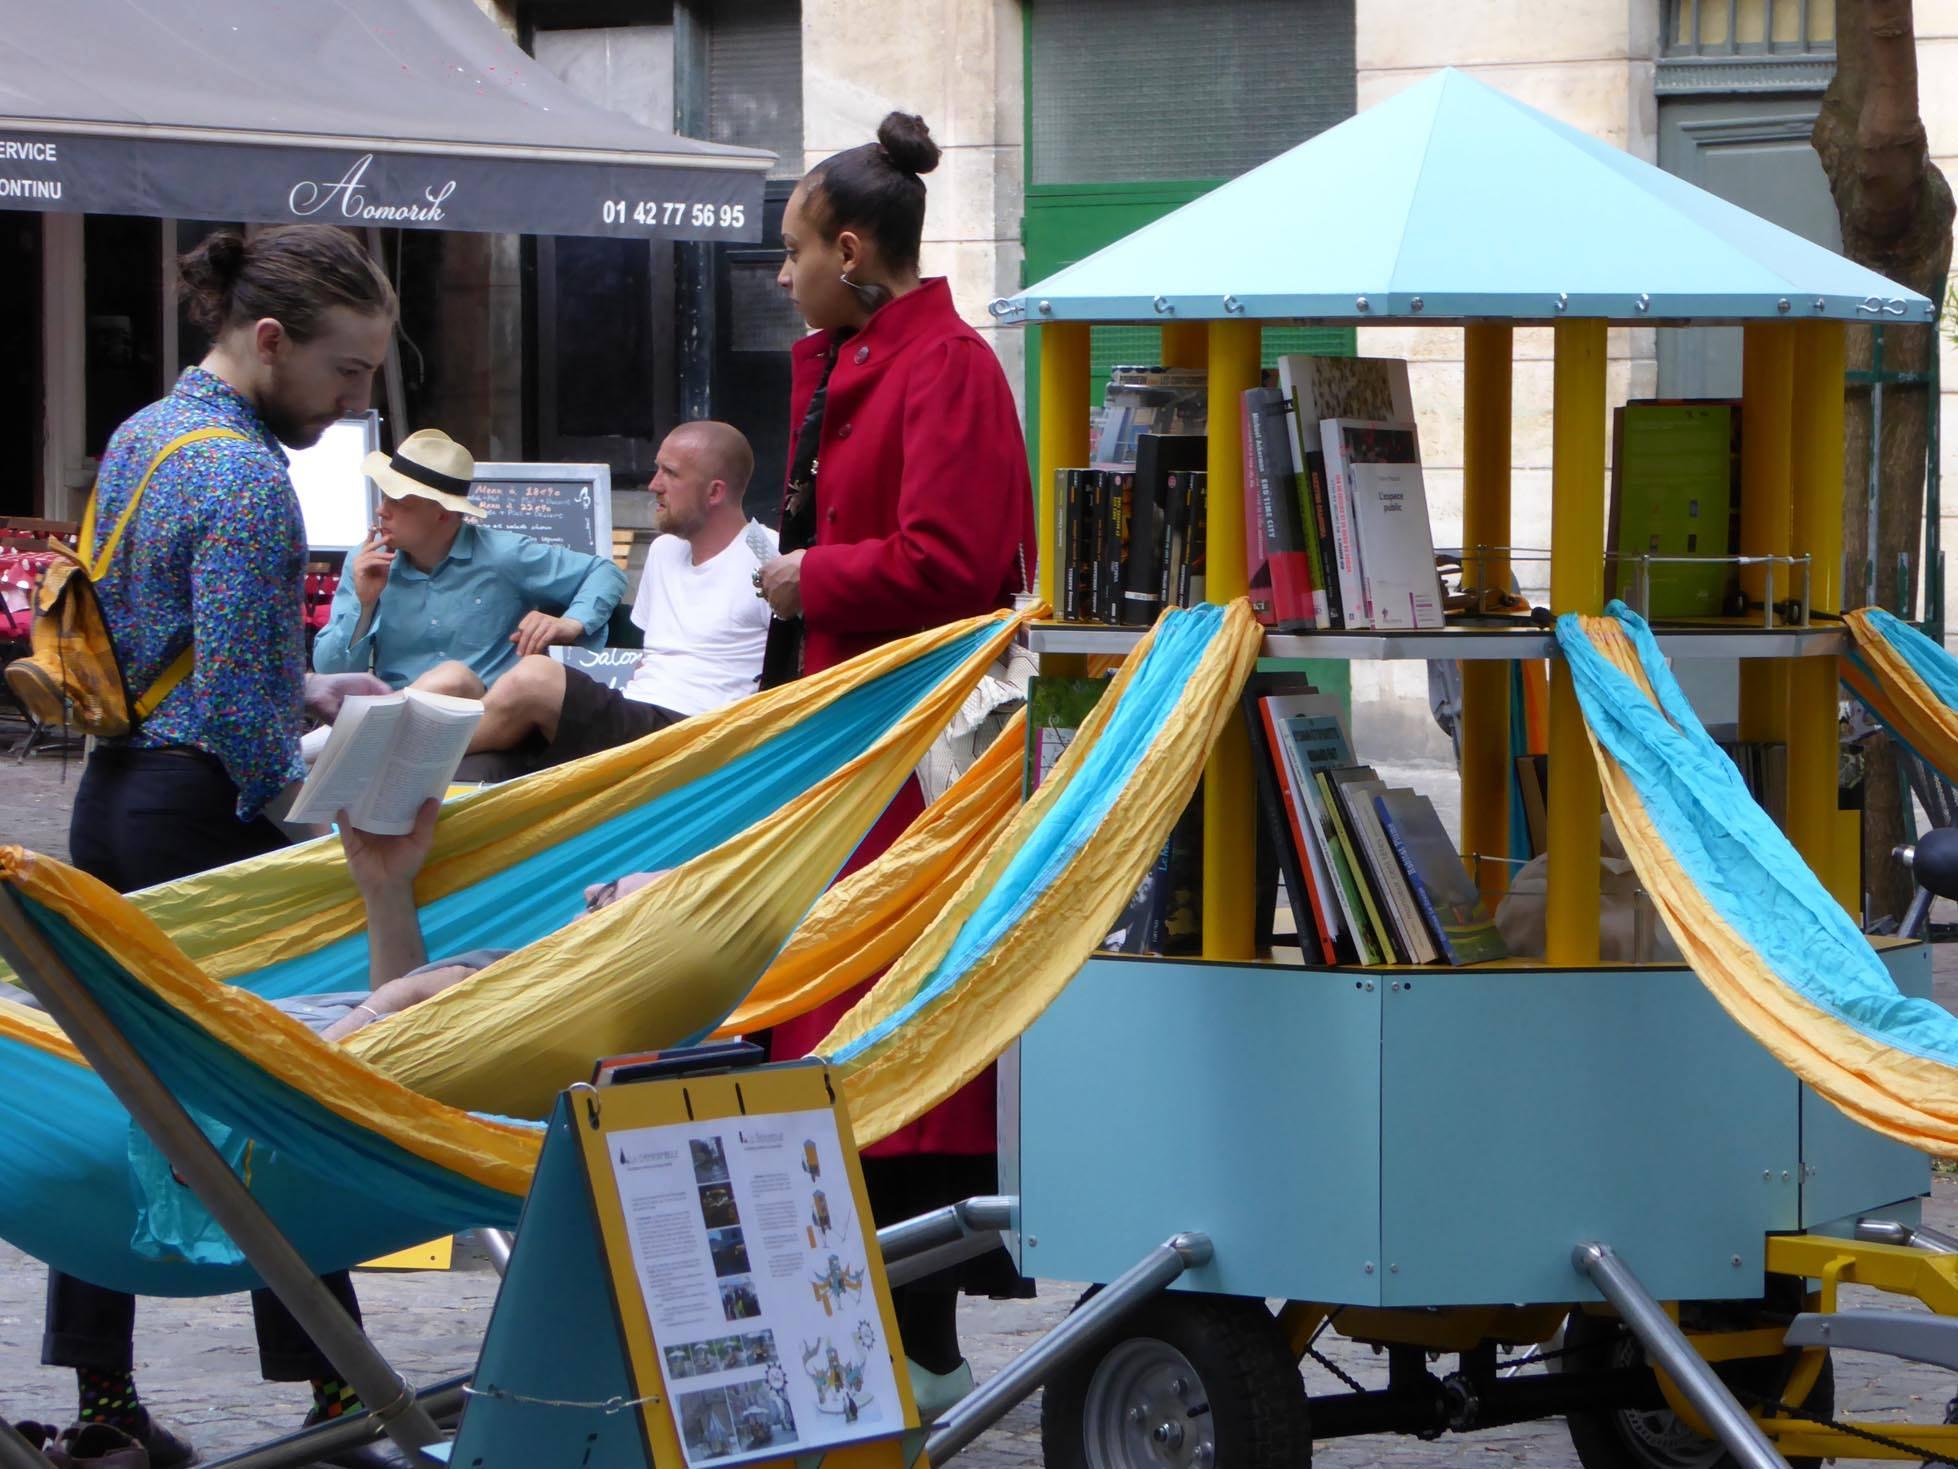 bibliambule bibliotheque mobile lecture